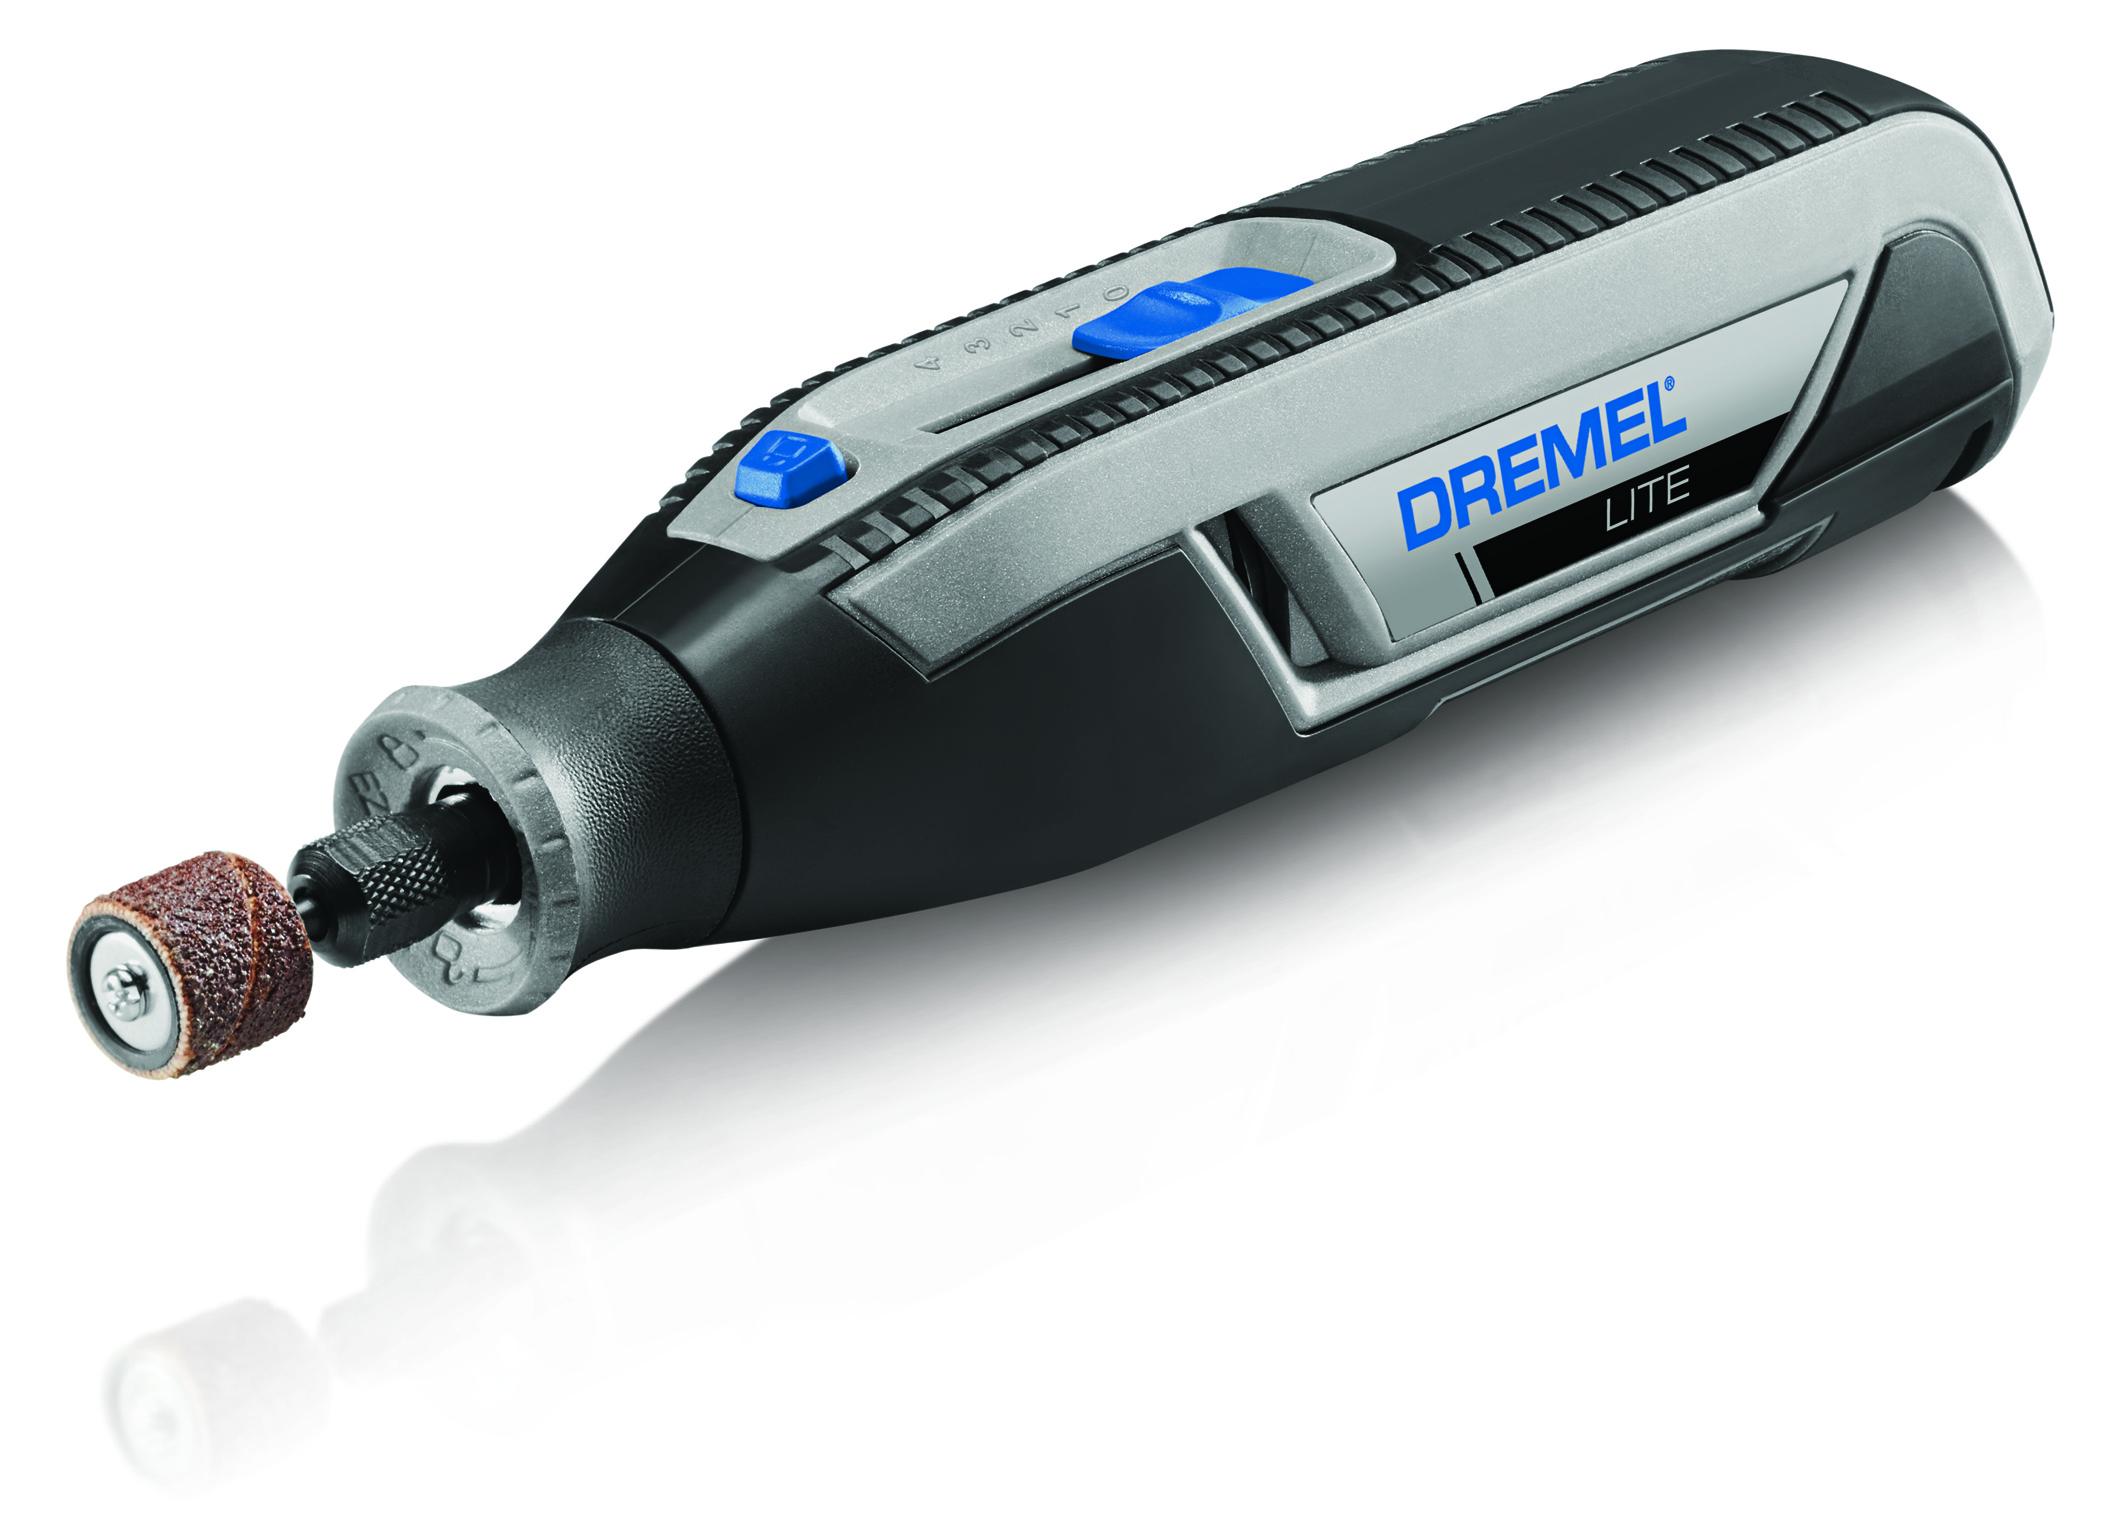 Better ergonomics based on user feedback: The cordless Dremel lite for controlled work